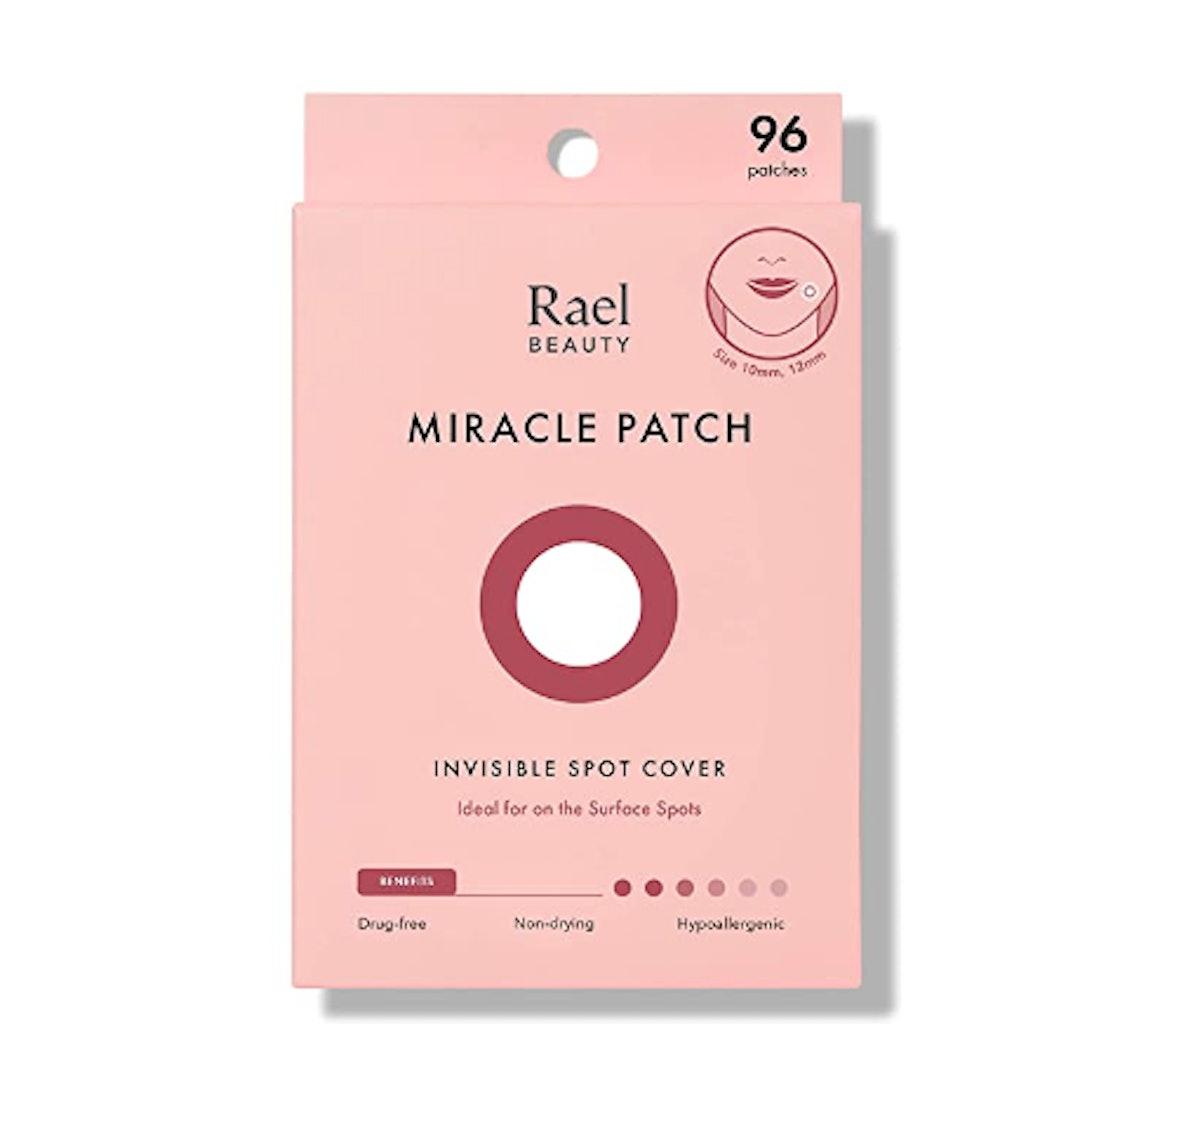 Rael Acne Pimple Healing Patch